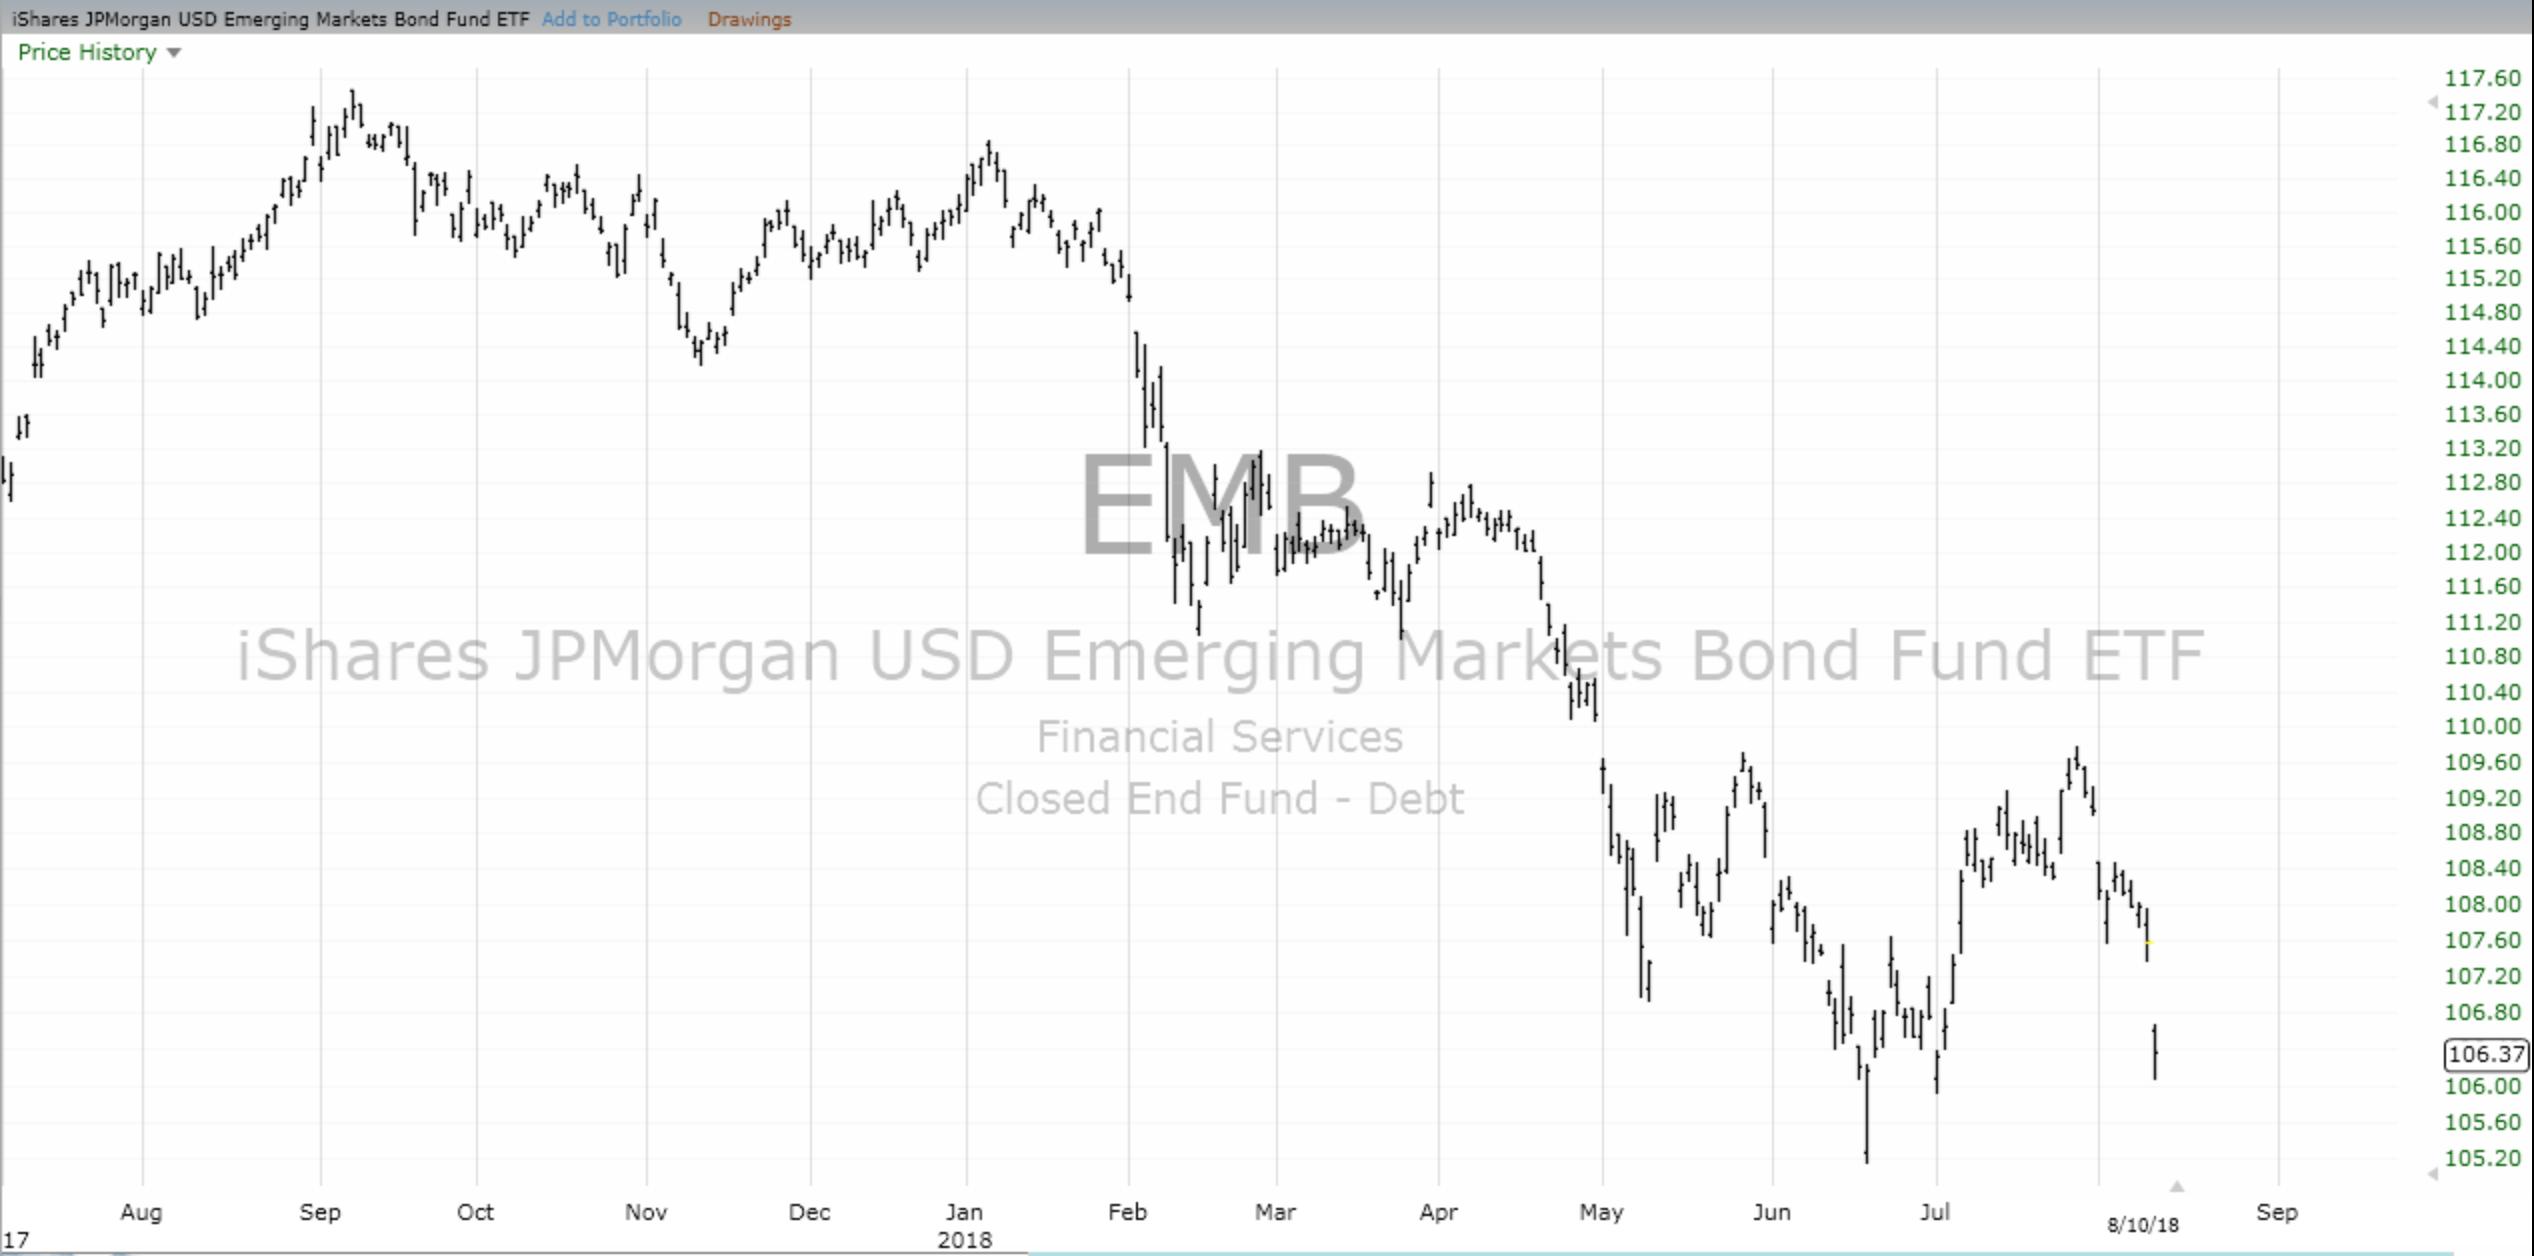 Bonos en Mercados Emergentes